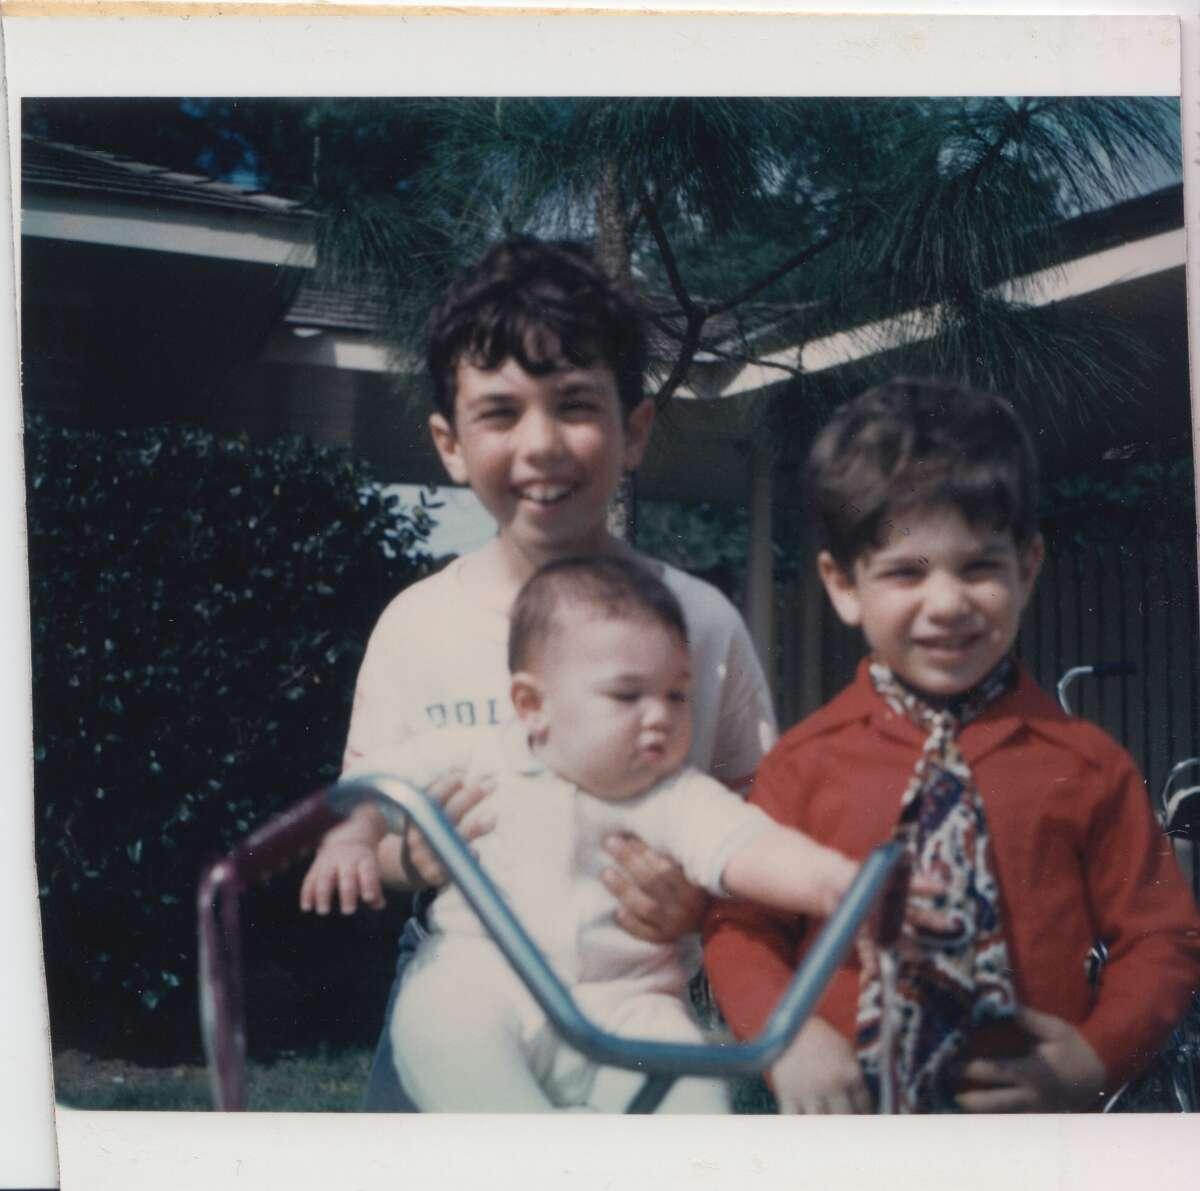 Evan Katz (back, left), holding his sister, Lissy. Lenny Katz is at right.